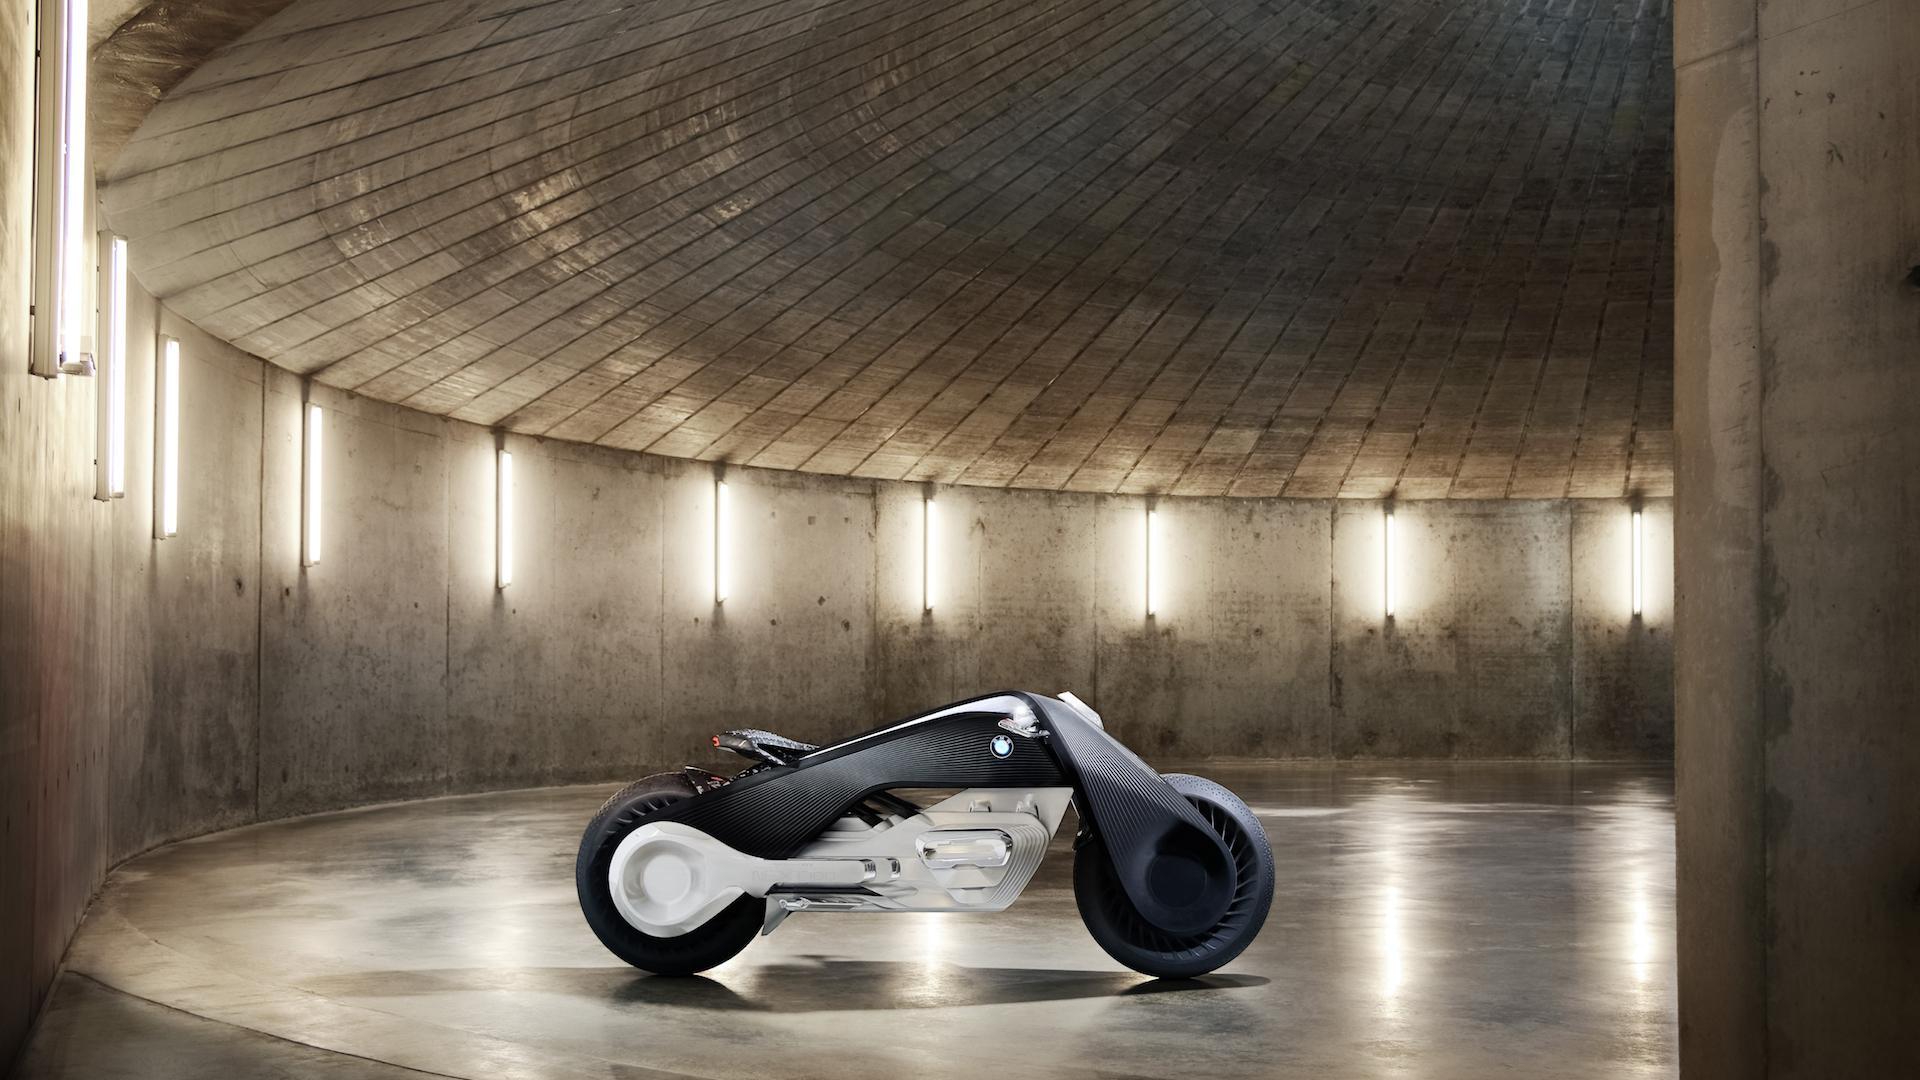 p90238690_highres_bmw-motorrad-vision